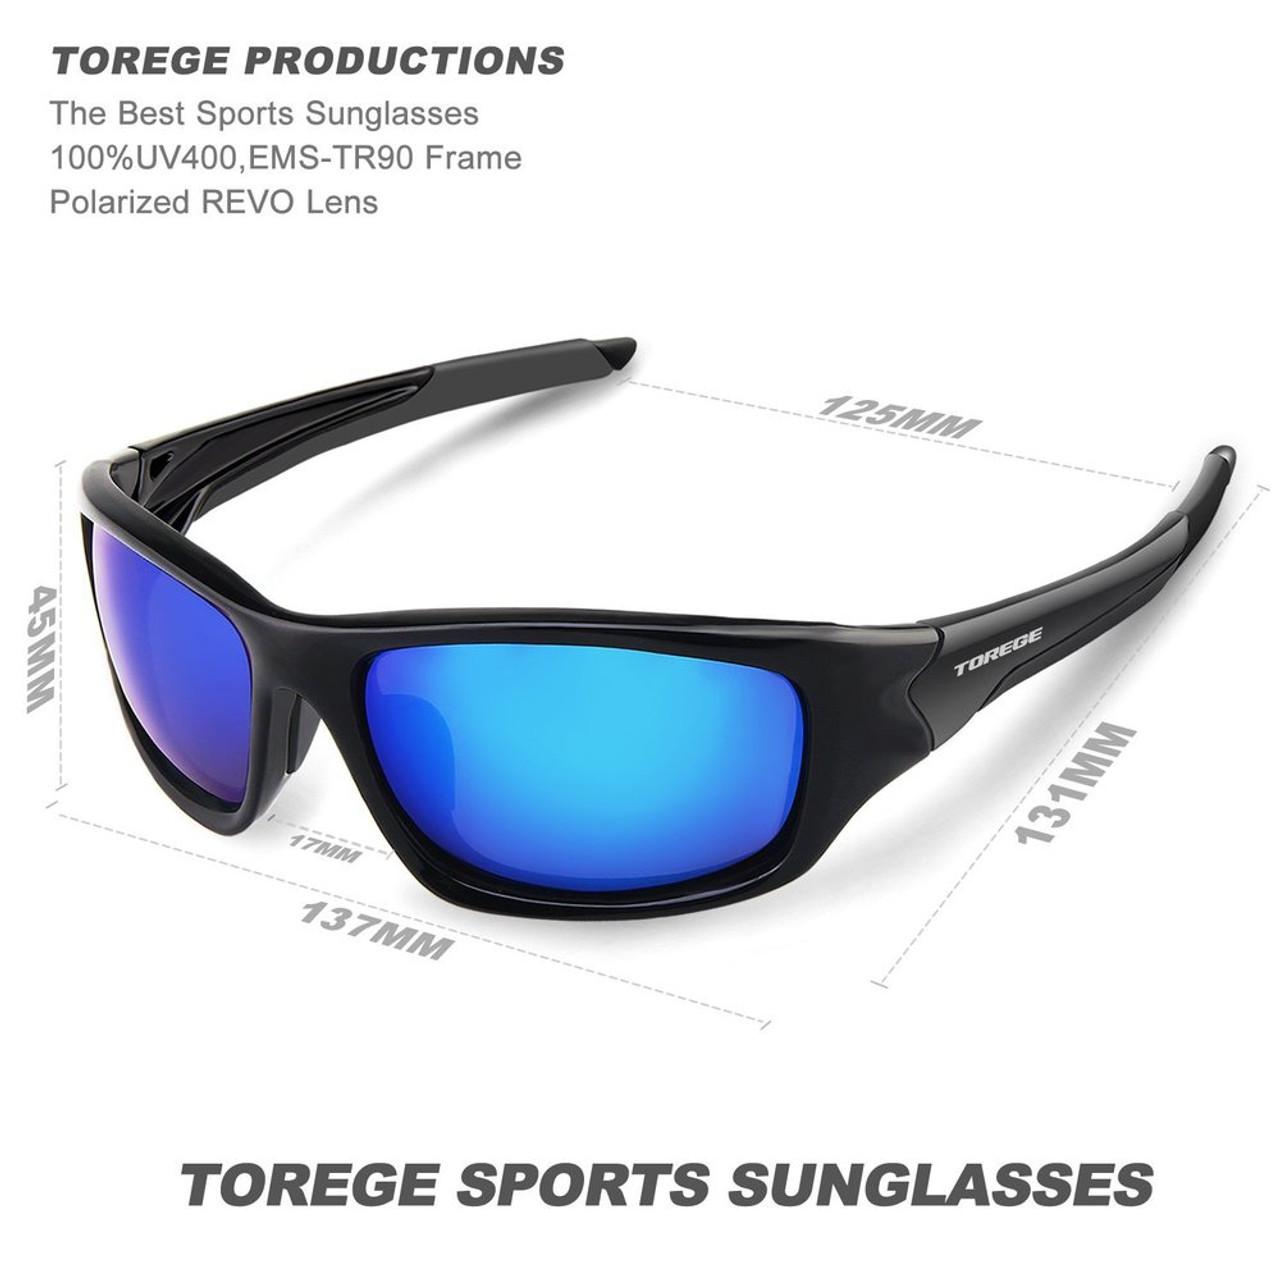 c2028fd18f7 ... TOREGE Men s Fashion Polarized Sunglasses For Driving Glasses TR90  Unbreakable Frame Eyewear Unisex 100% UV400 ...